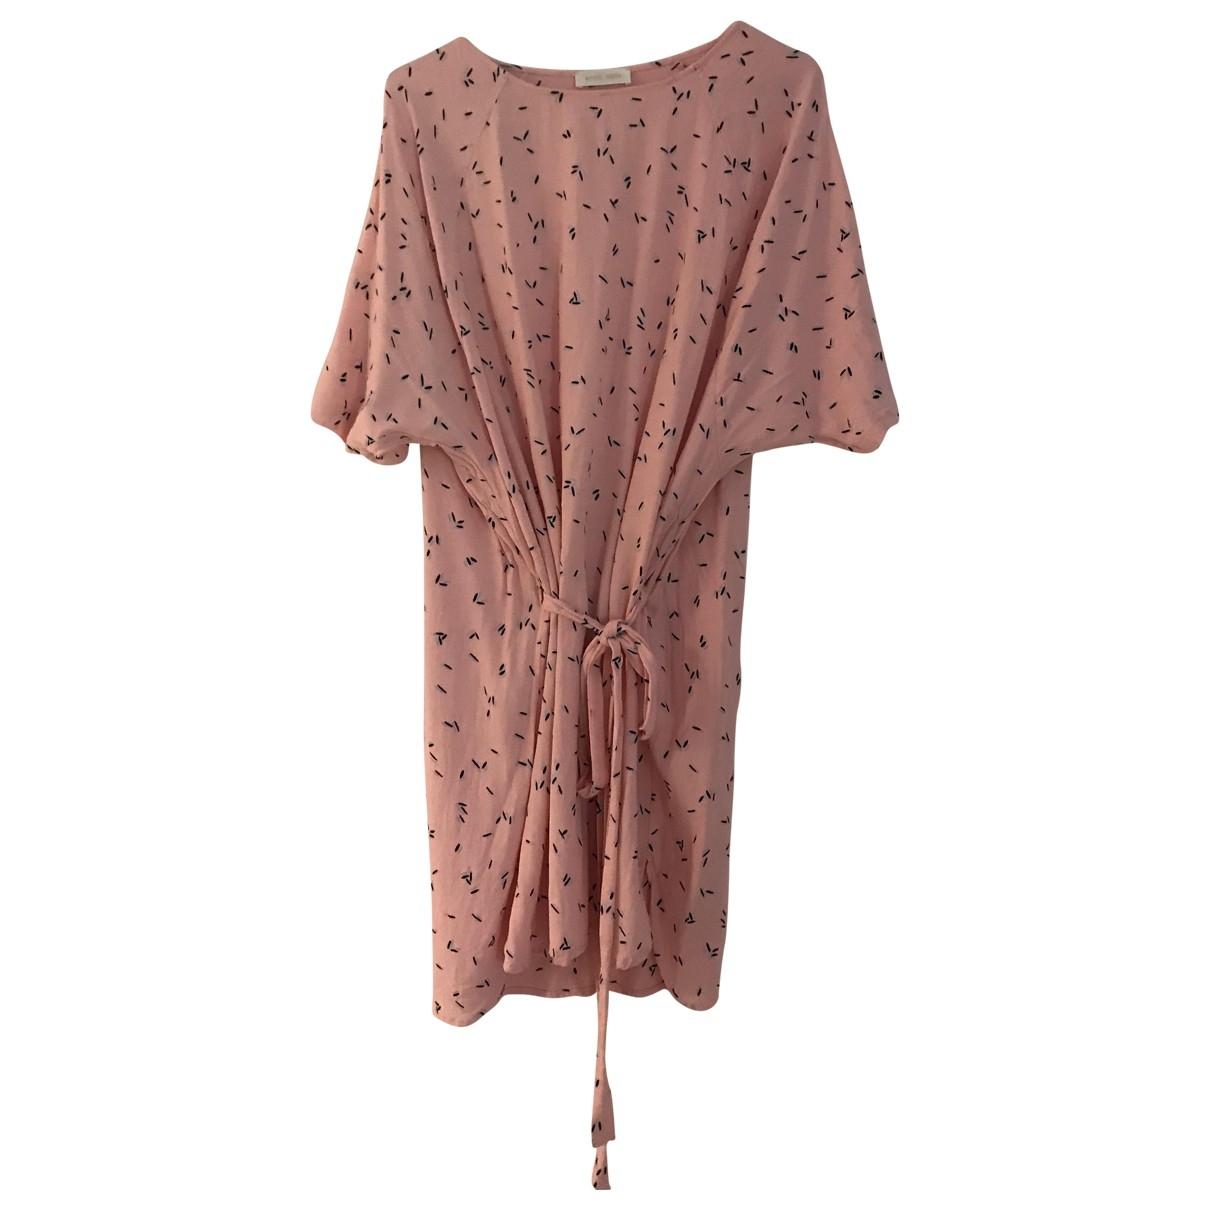 Stine Goya \N Pink dress for Women S International